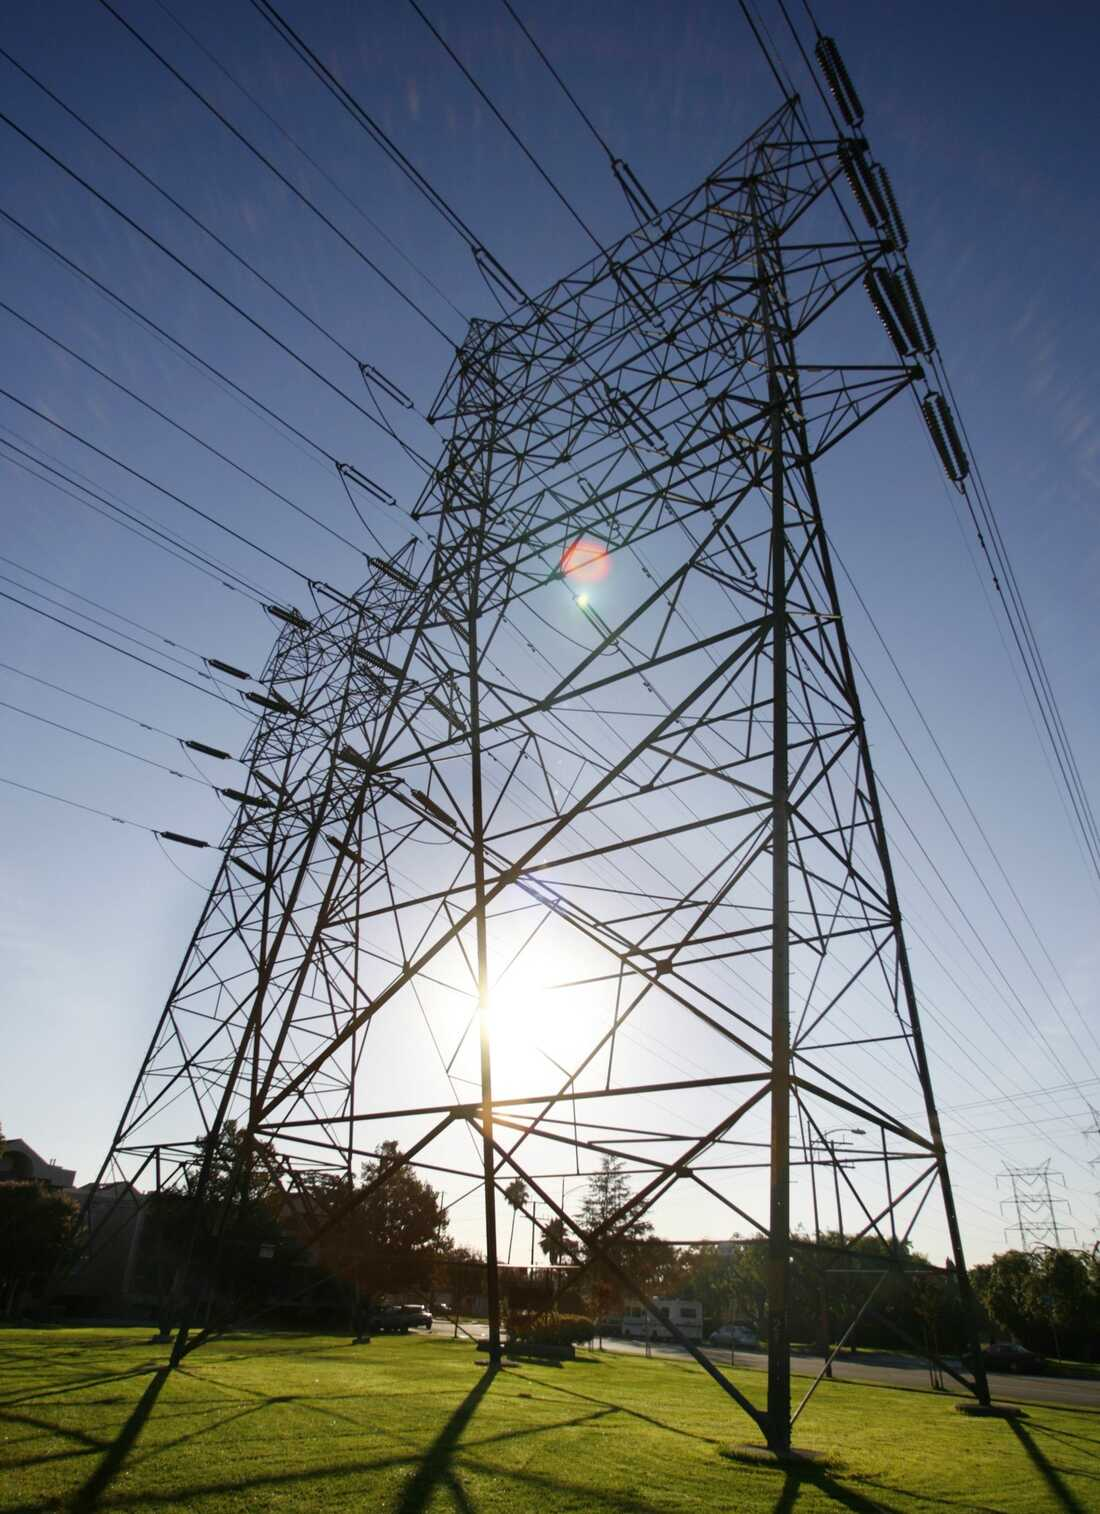 Power lines in Burbank, Calif.